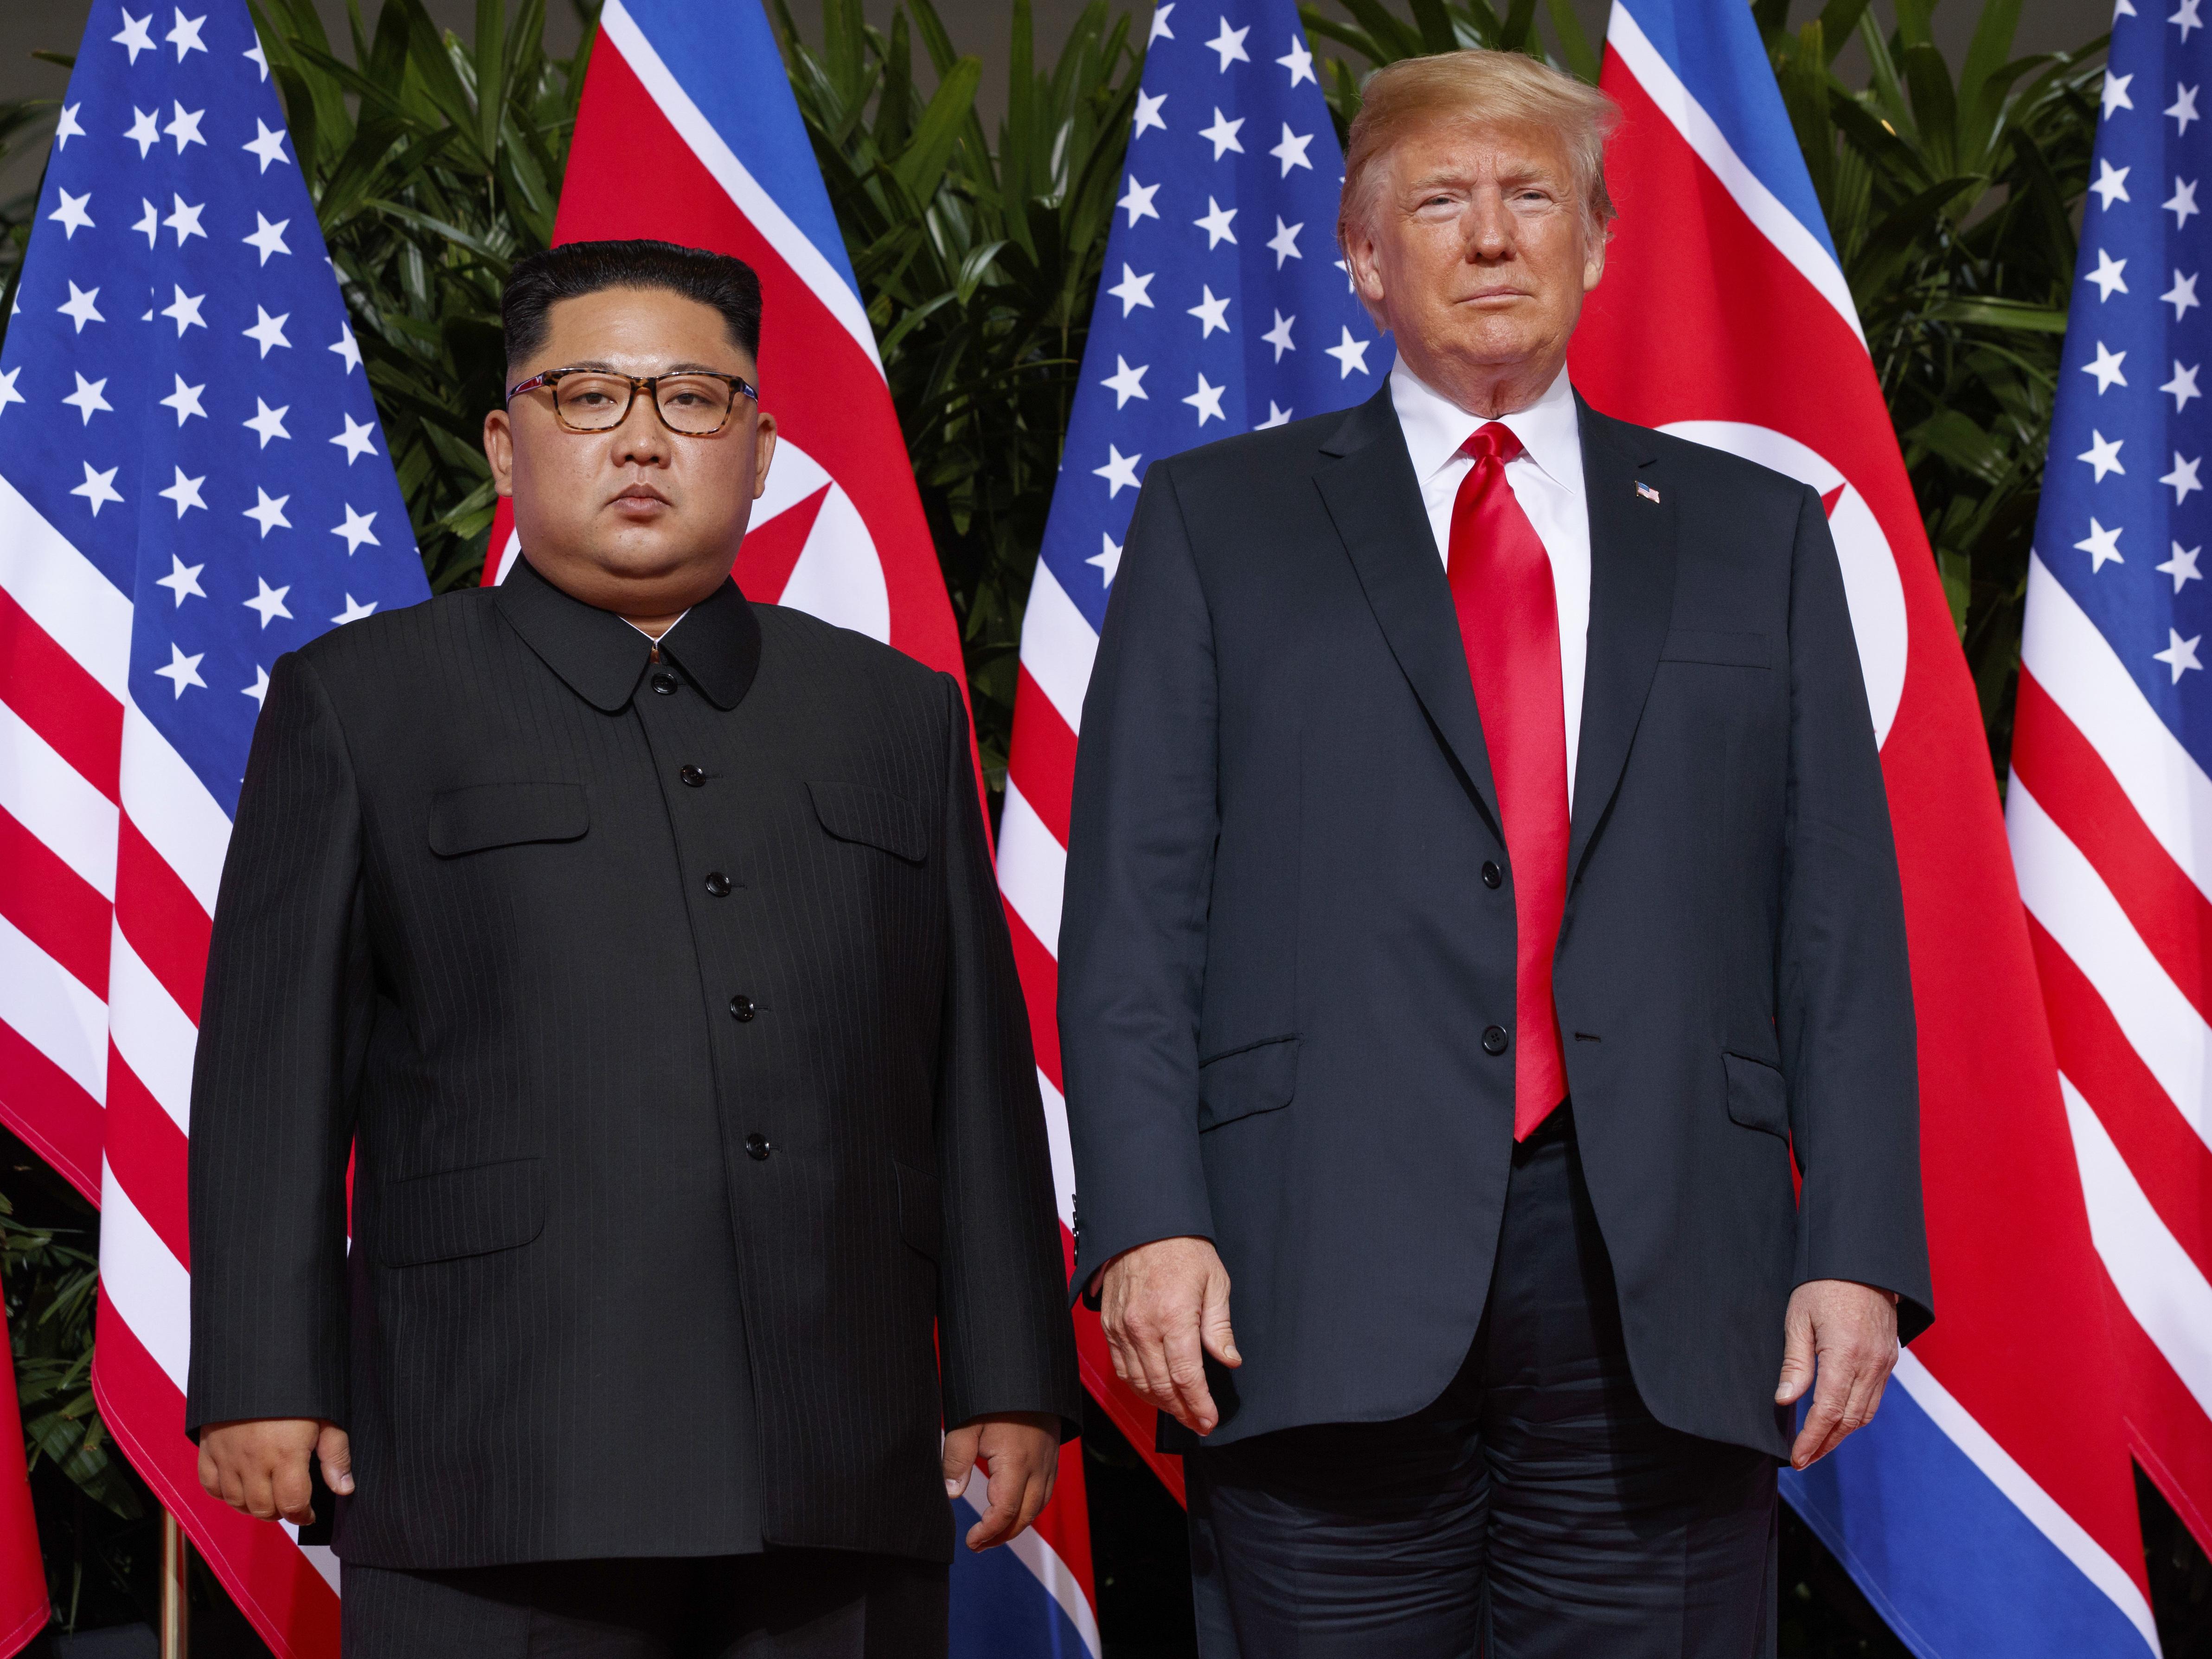 North Korea Denuclearization Plan Has Gone Nowhere Since Trump-Kim Summit